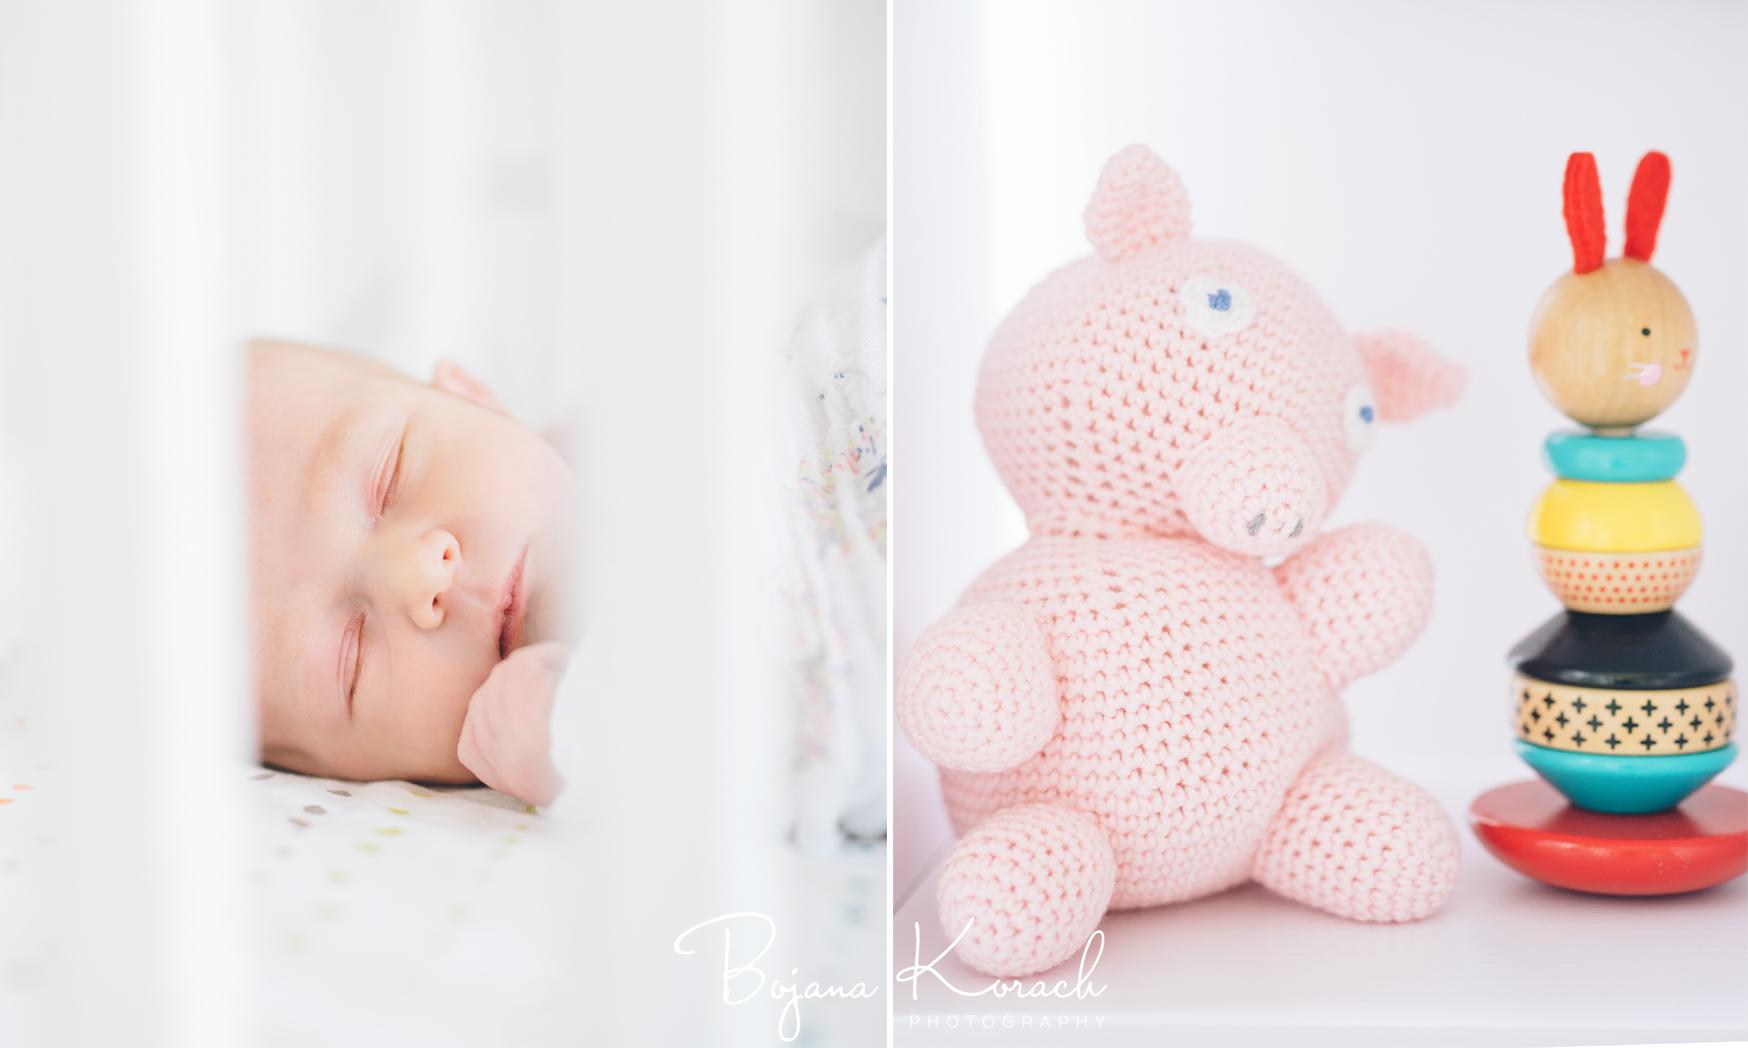 newborn baby girl sleeping in a crib